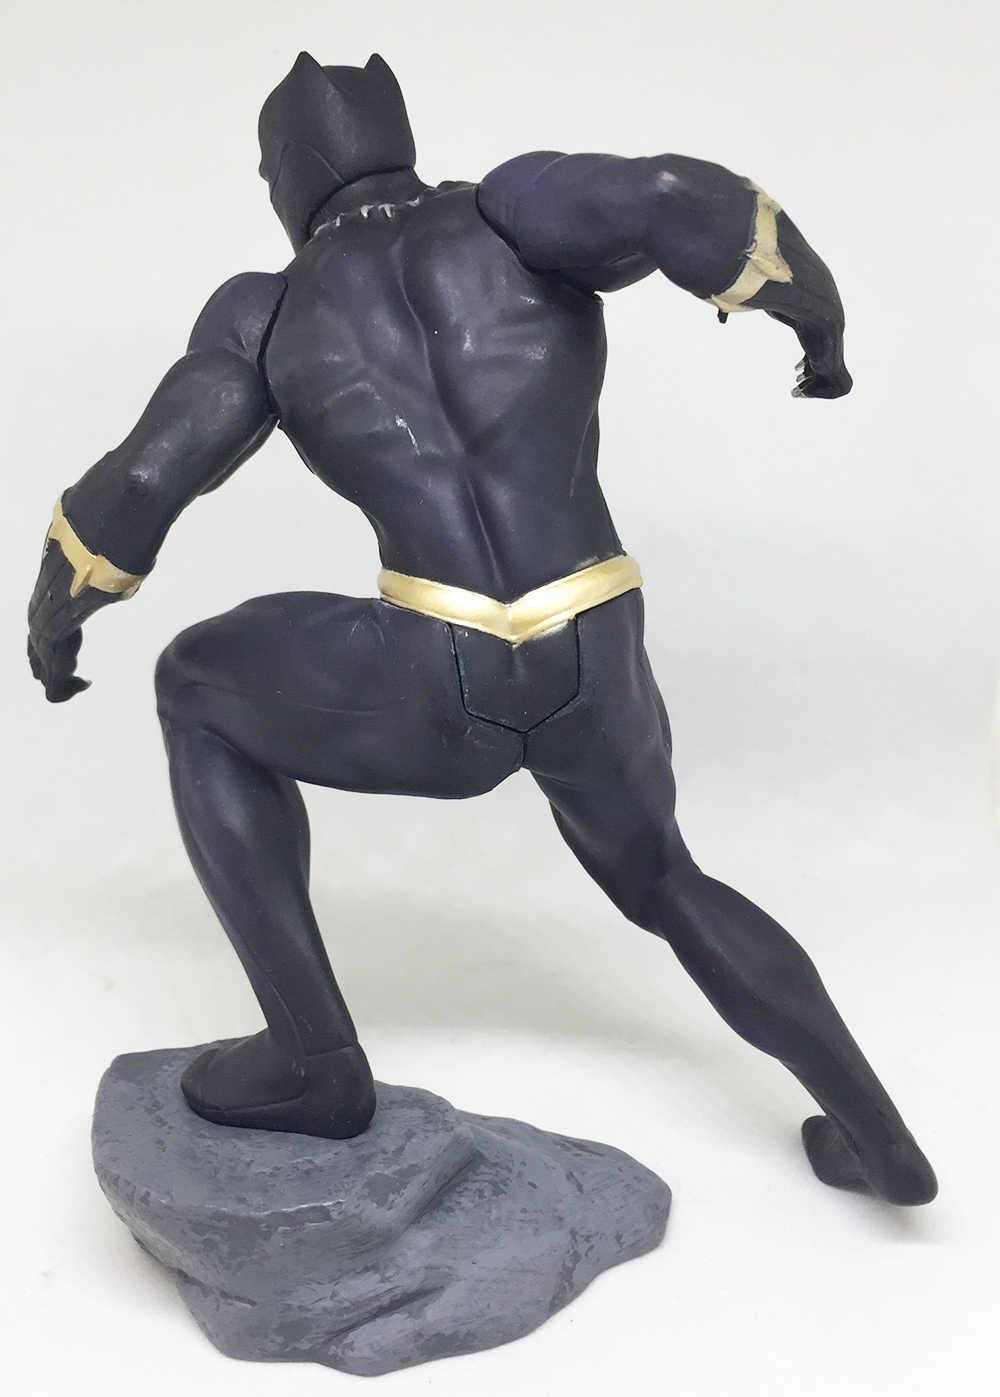 18 cm Maravilha ARTFX Brinquedos Avengers Infinito Guerra Pantera Negra PVC Action Figure Modelo Toy Presente de Natal